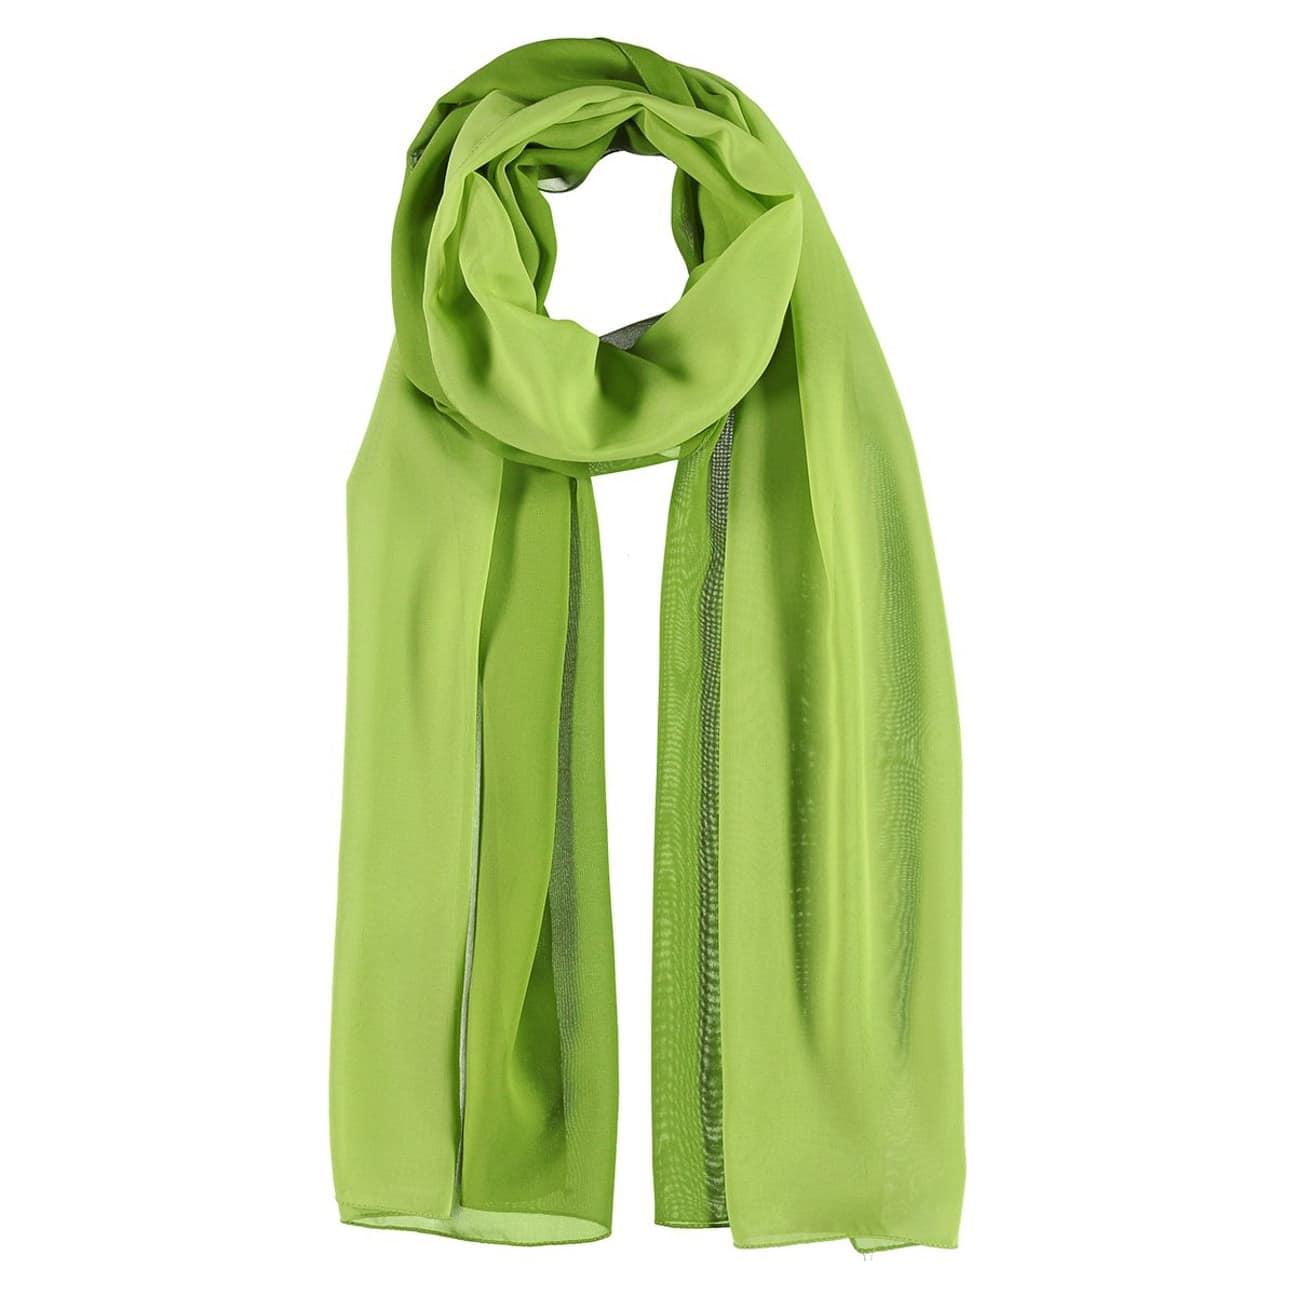 bf10076fd7bc7b ... Polyester Chiffon Scarf by Passigatti - green 1 ...